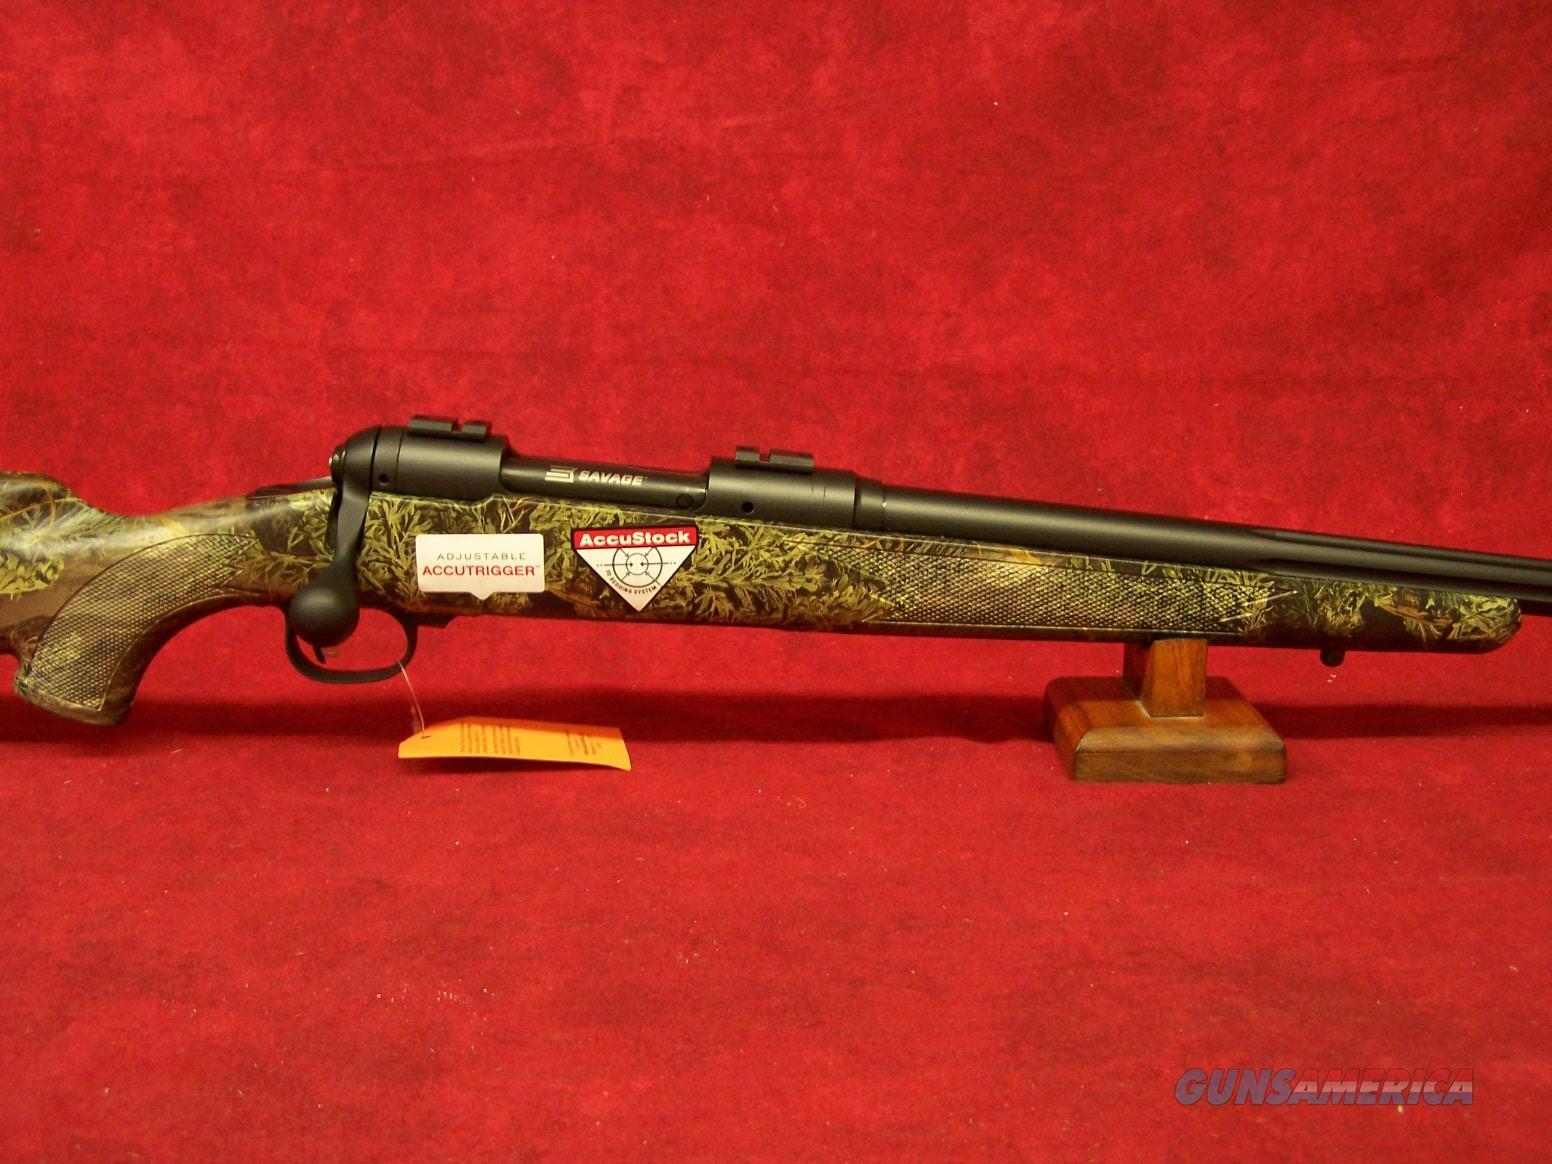 "SAVAGE 10 PREDATOR HUNTER DBM 22-250 24"" RTMAX1 ACCUTRIGGER (18888)  Guns > Rifles > Savage Rifles > 10/110"